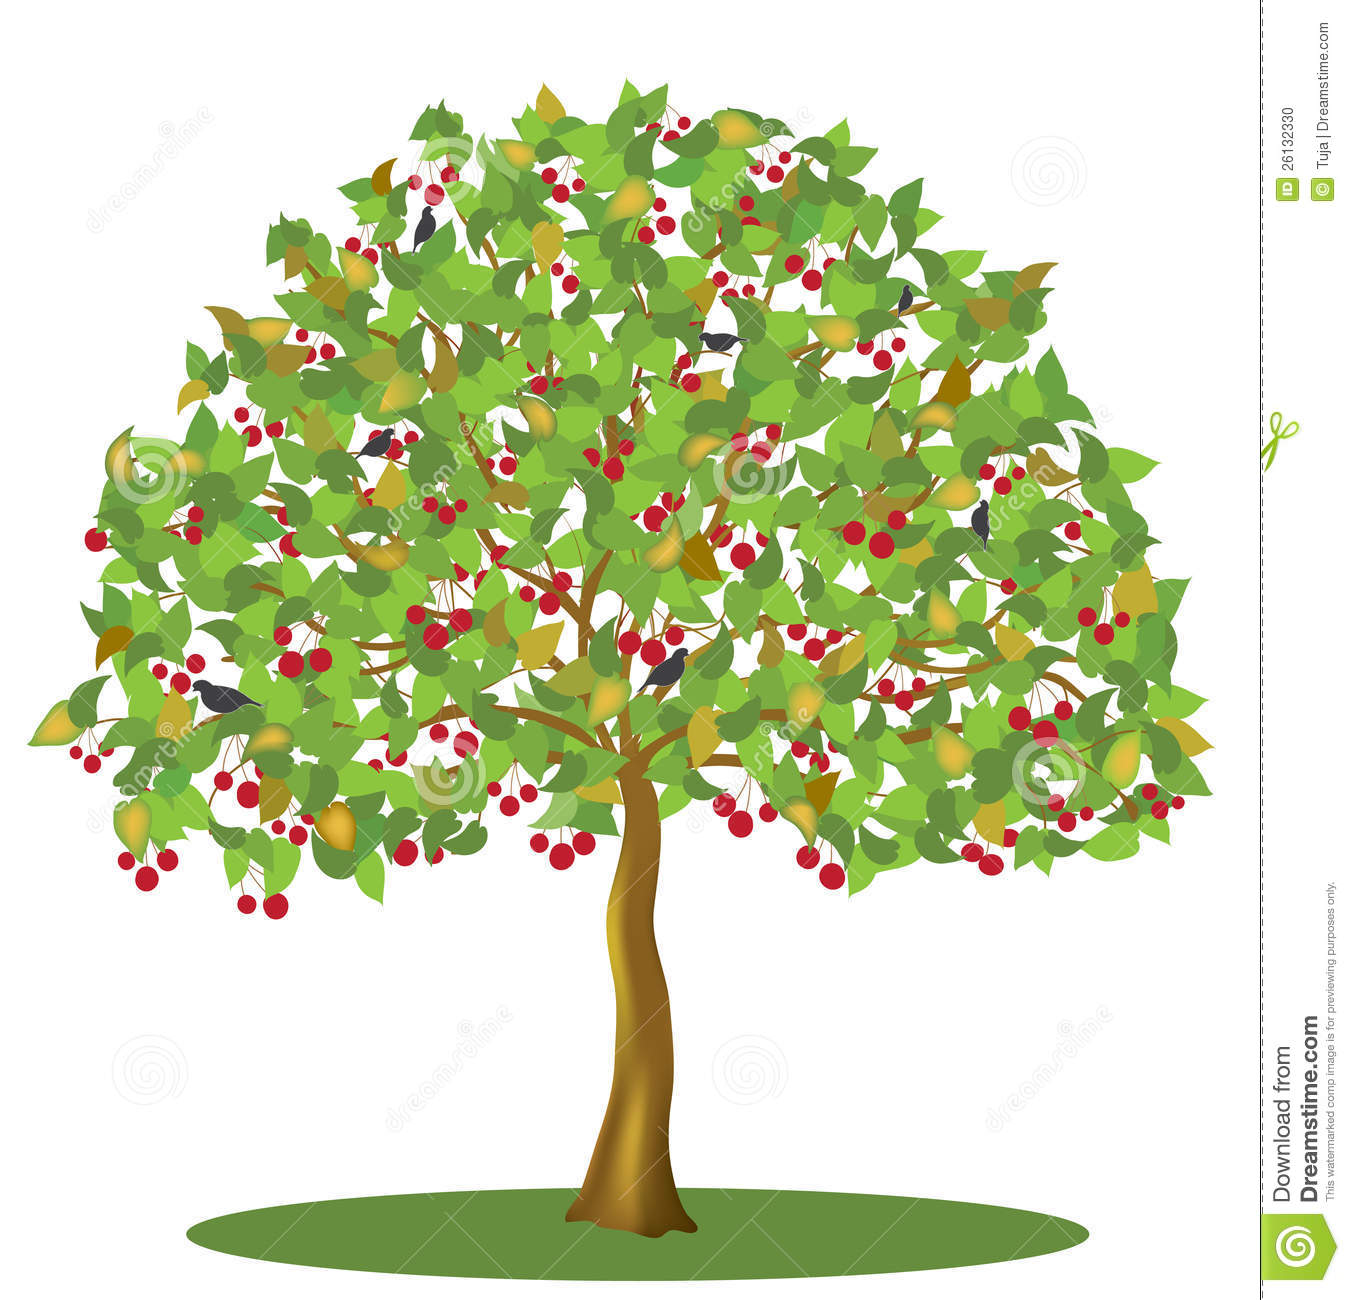 Learn More At ... Cherry Tree .-Learn more at ... cherry tree .-17